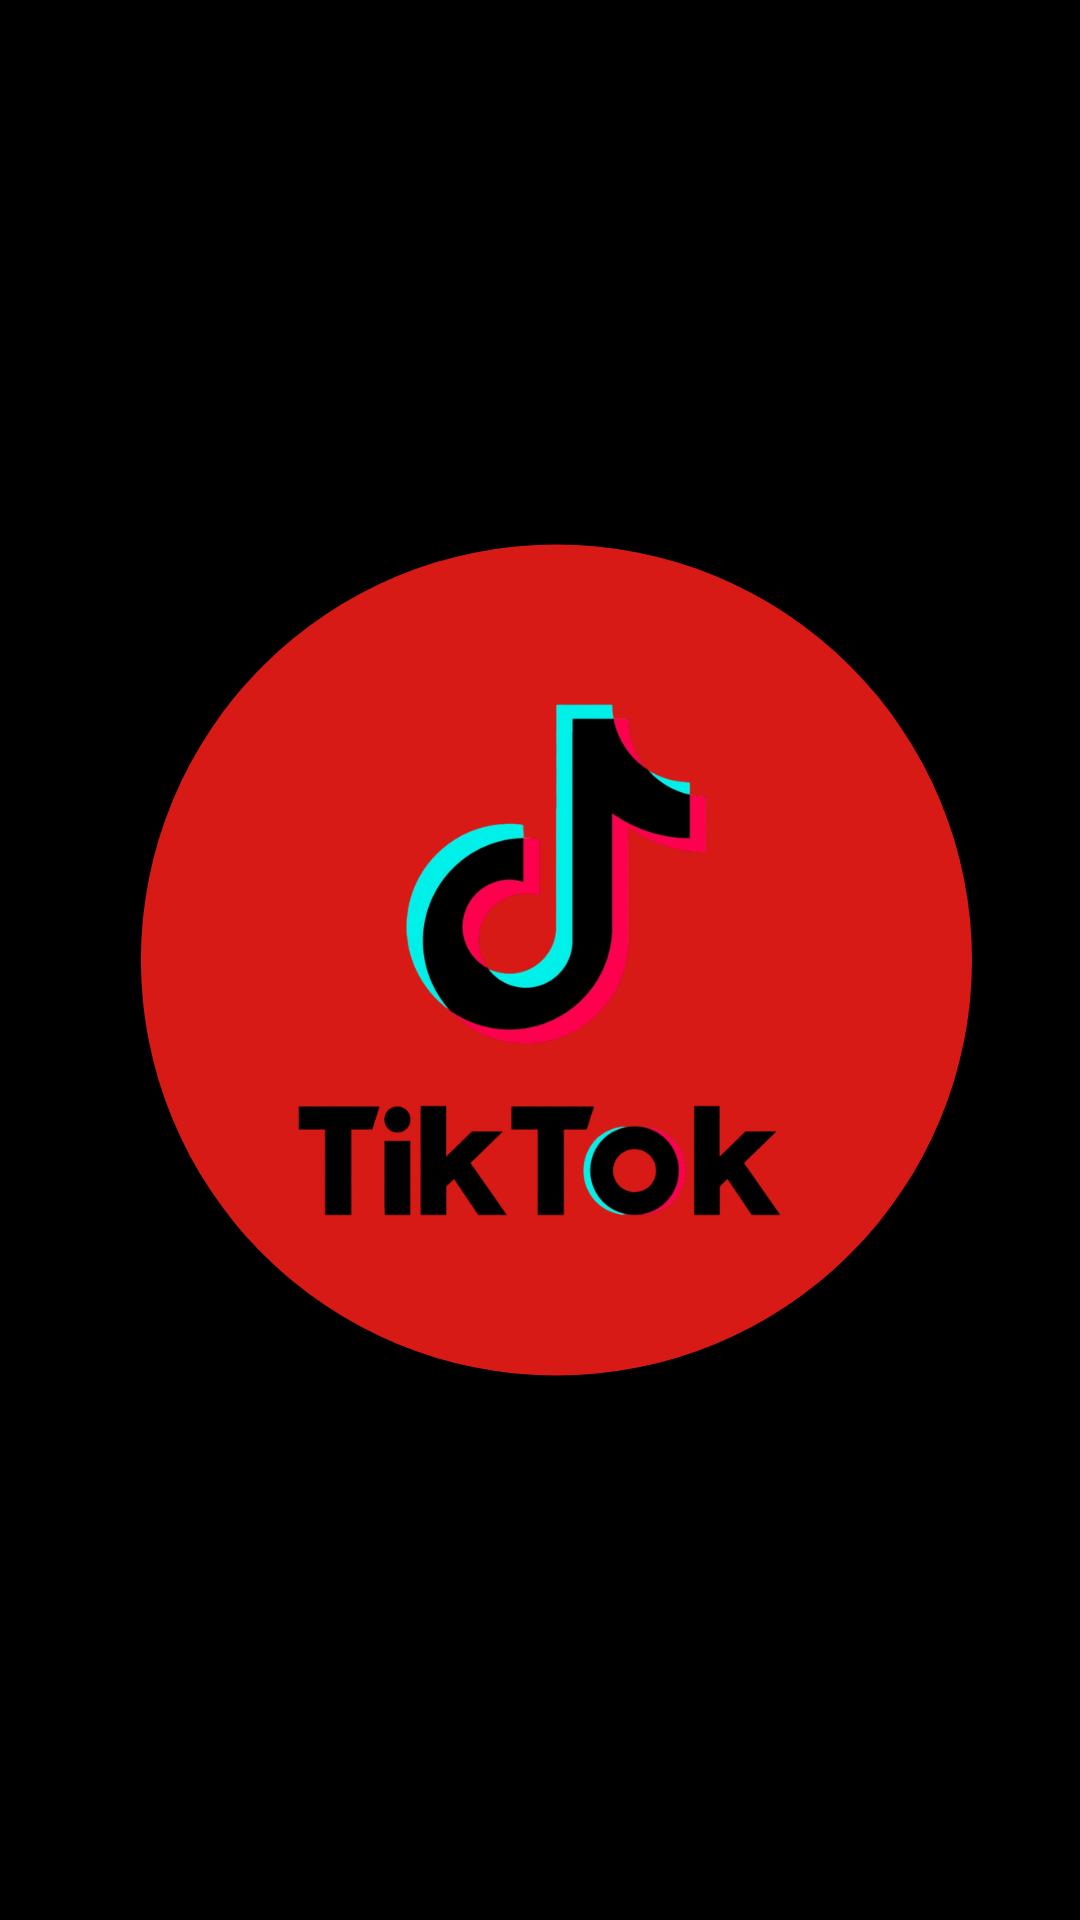 Pin Di Tic Toc Videos